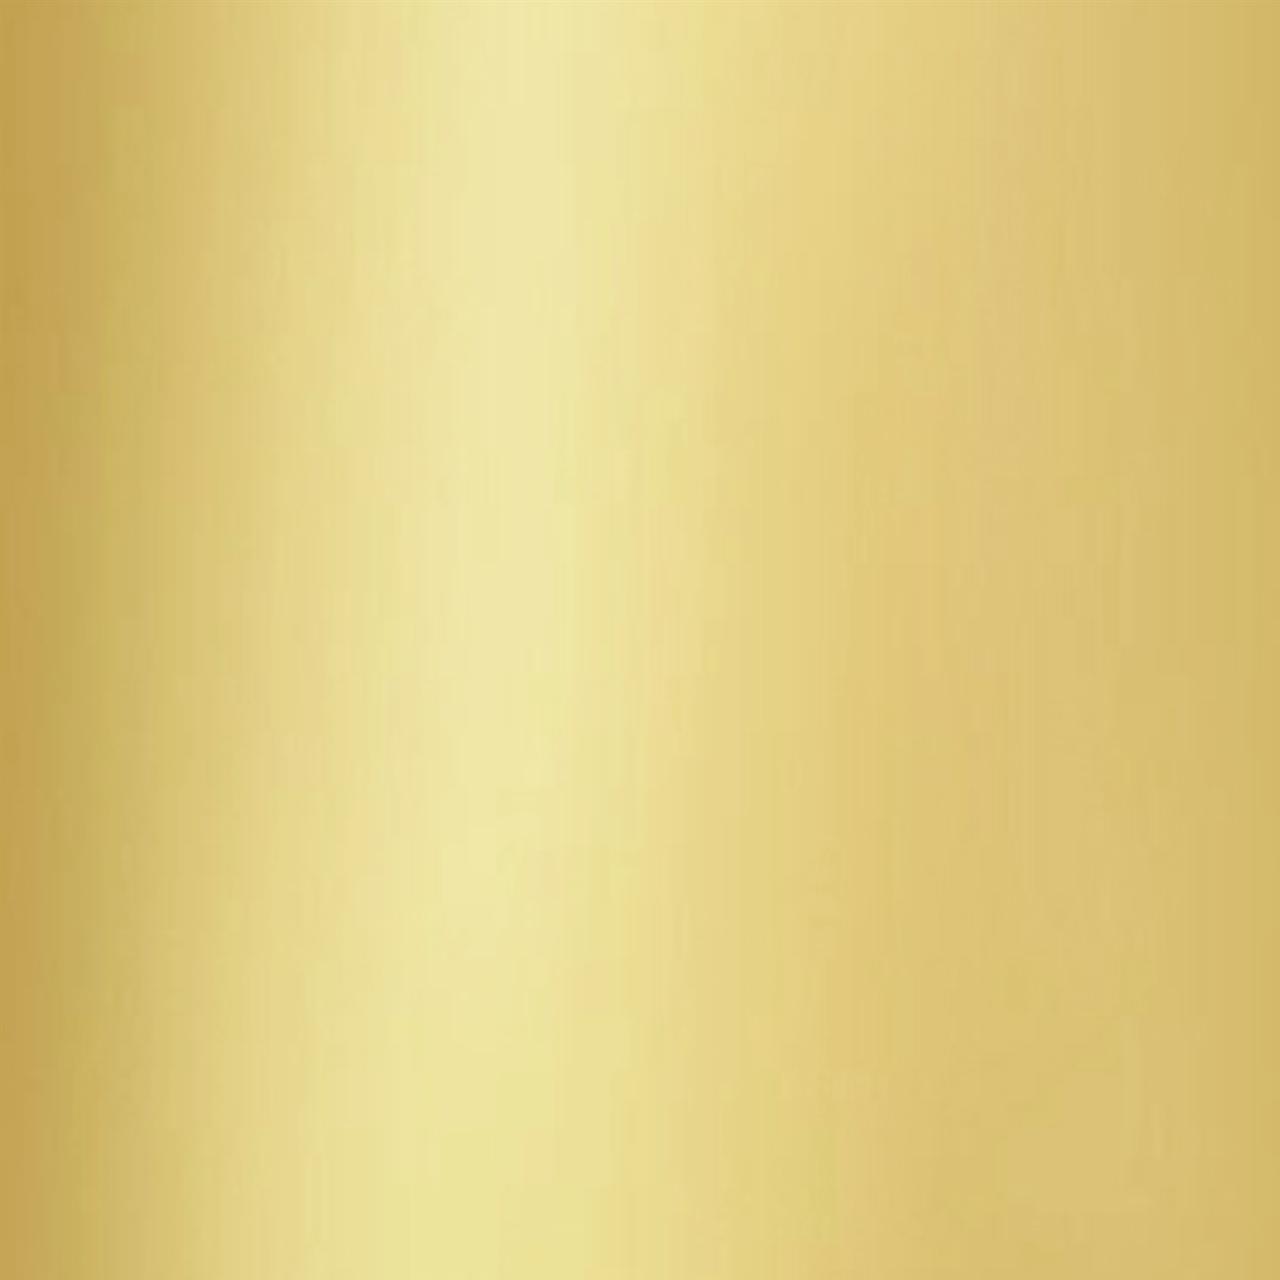 Алюкобонд зеркальное золото 8833 (3мм/28мкм) 1,22мХ2,44м